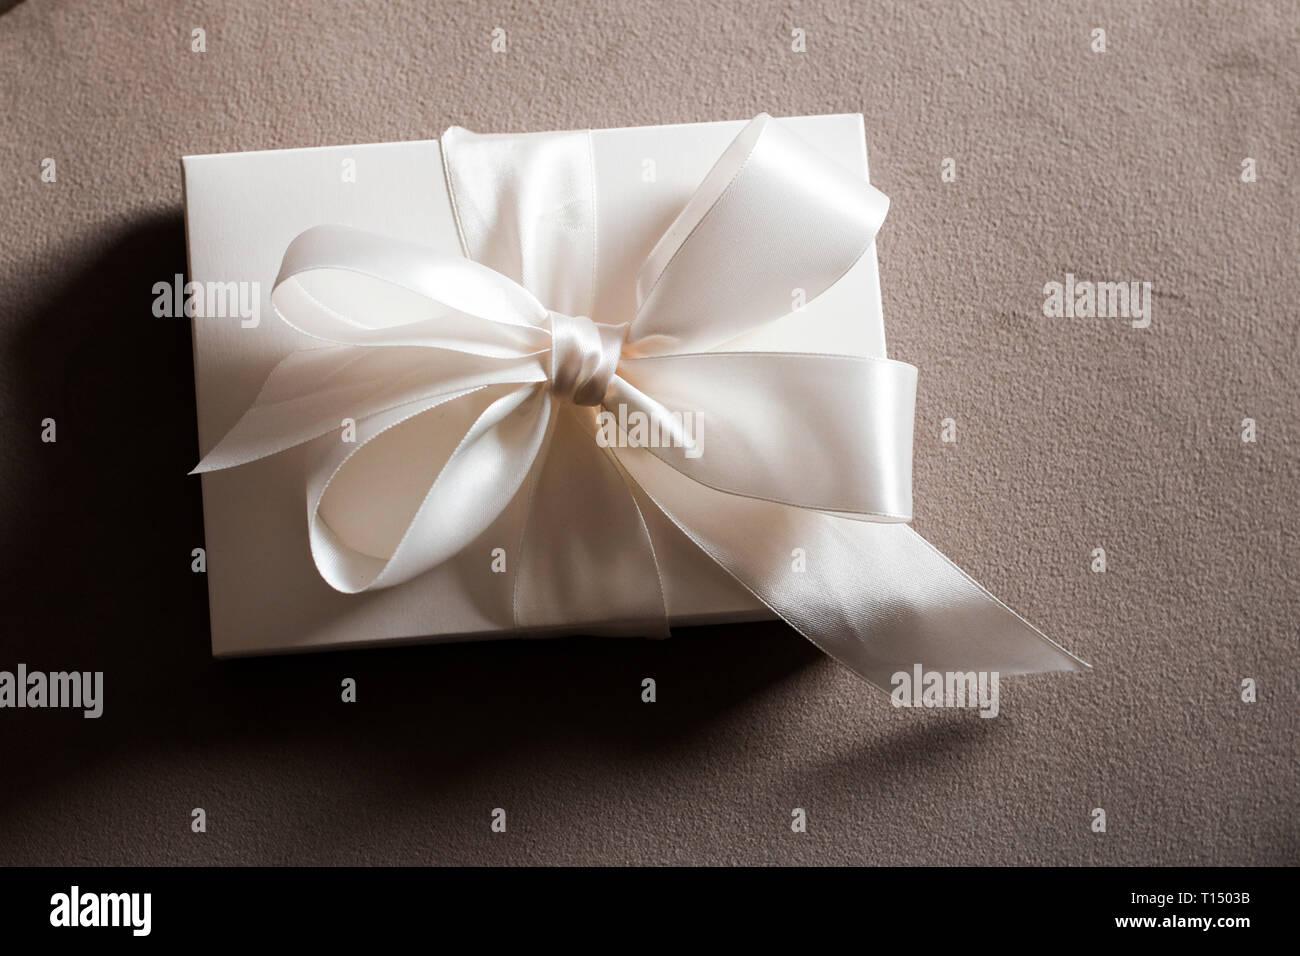 Romantic celebration, lifestyle and birthday present concept